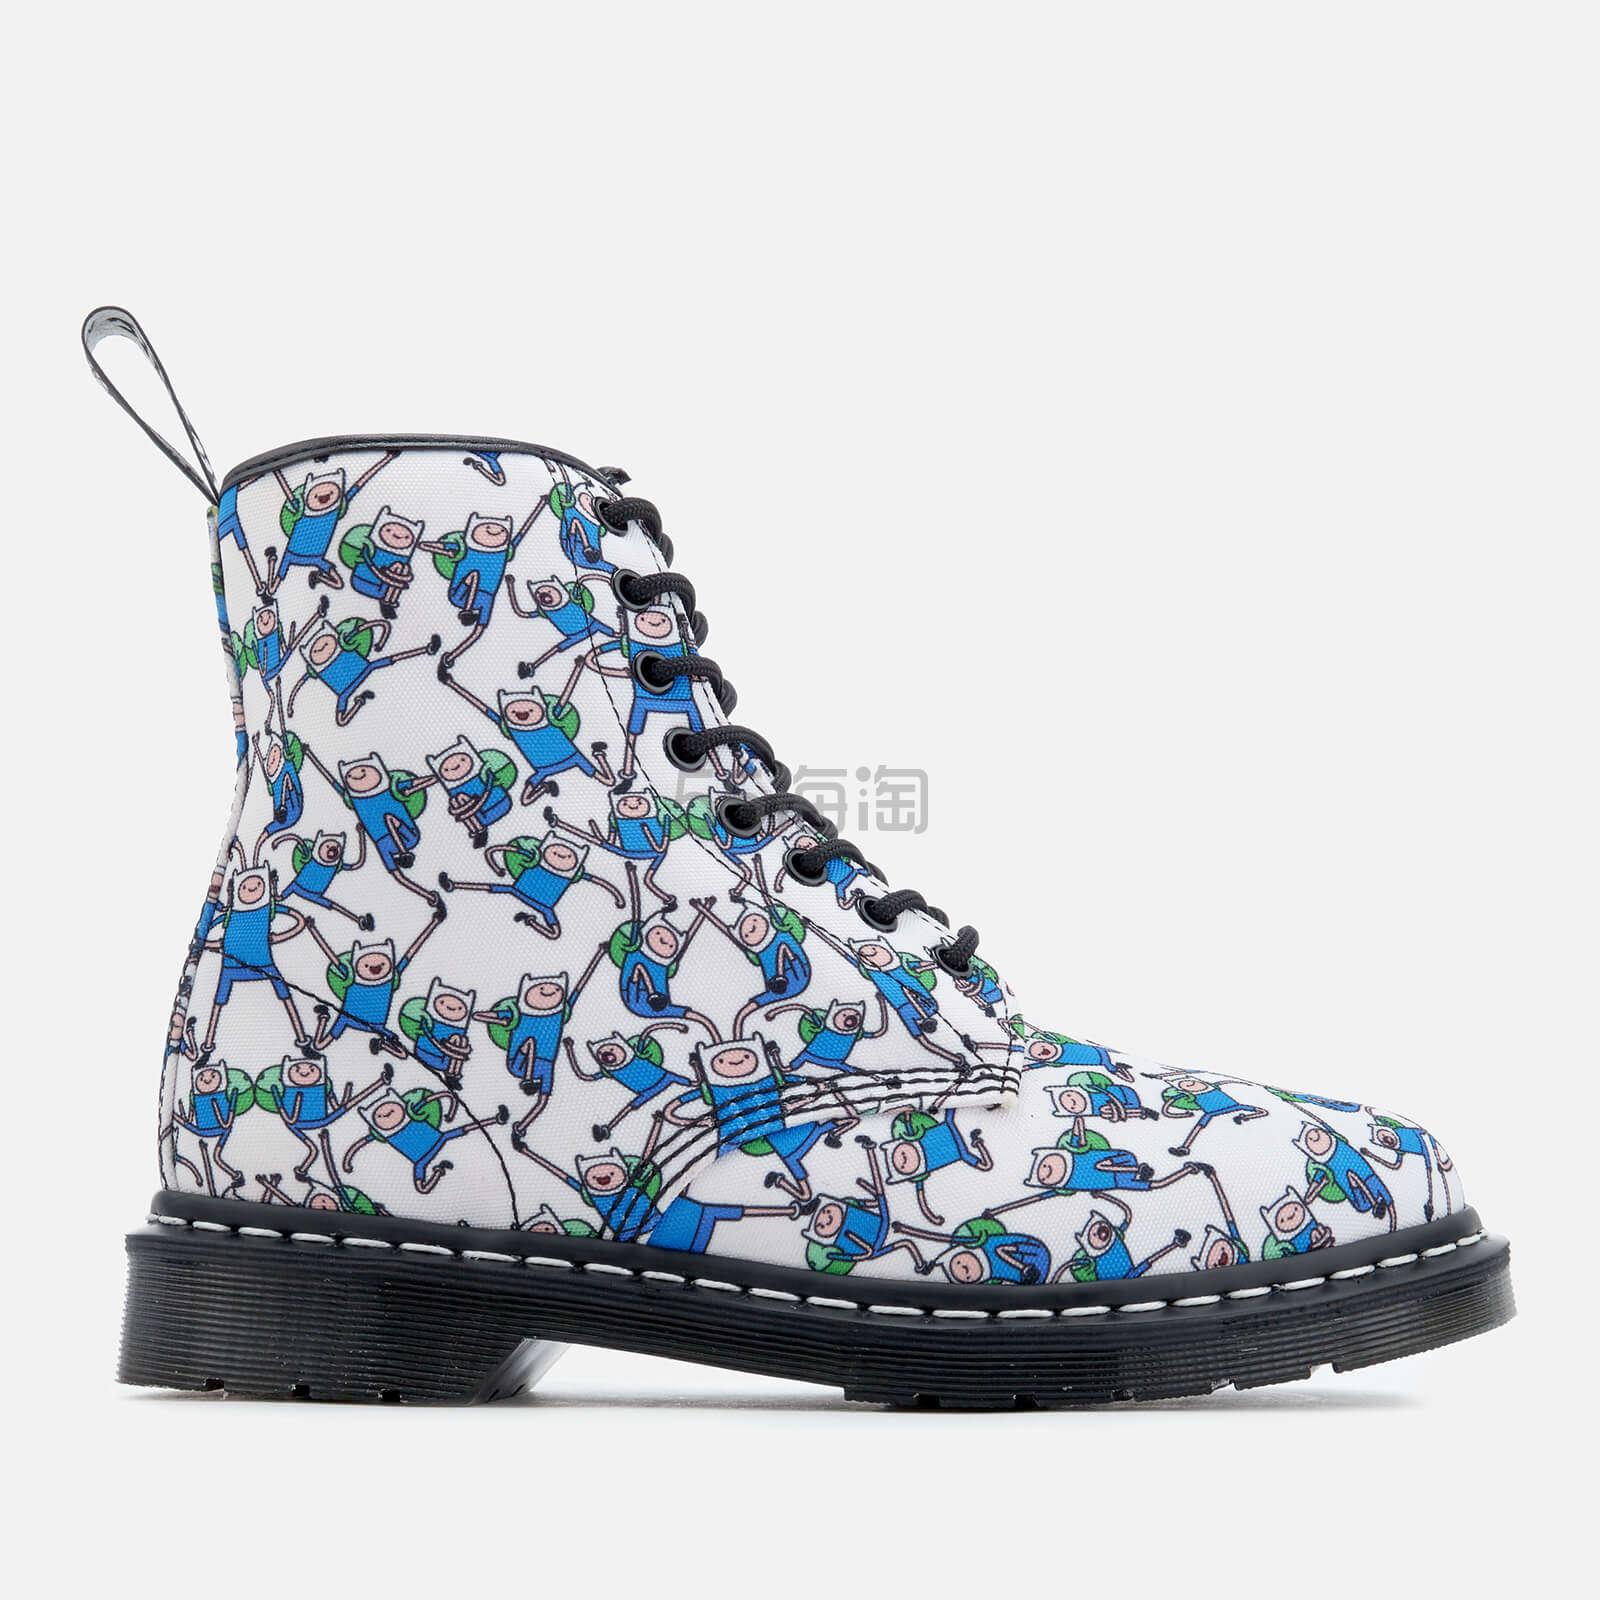 【大码福利】Dr. Martens Castel Canvas Finn 女士马丁靴